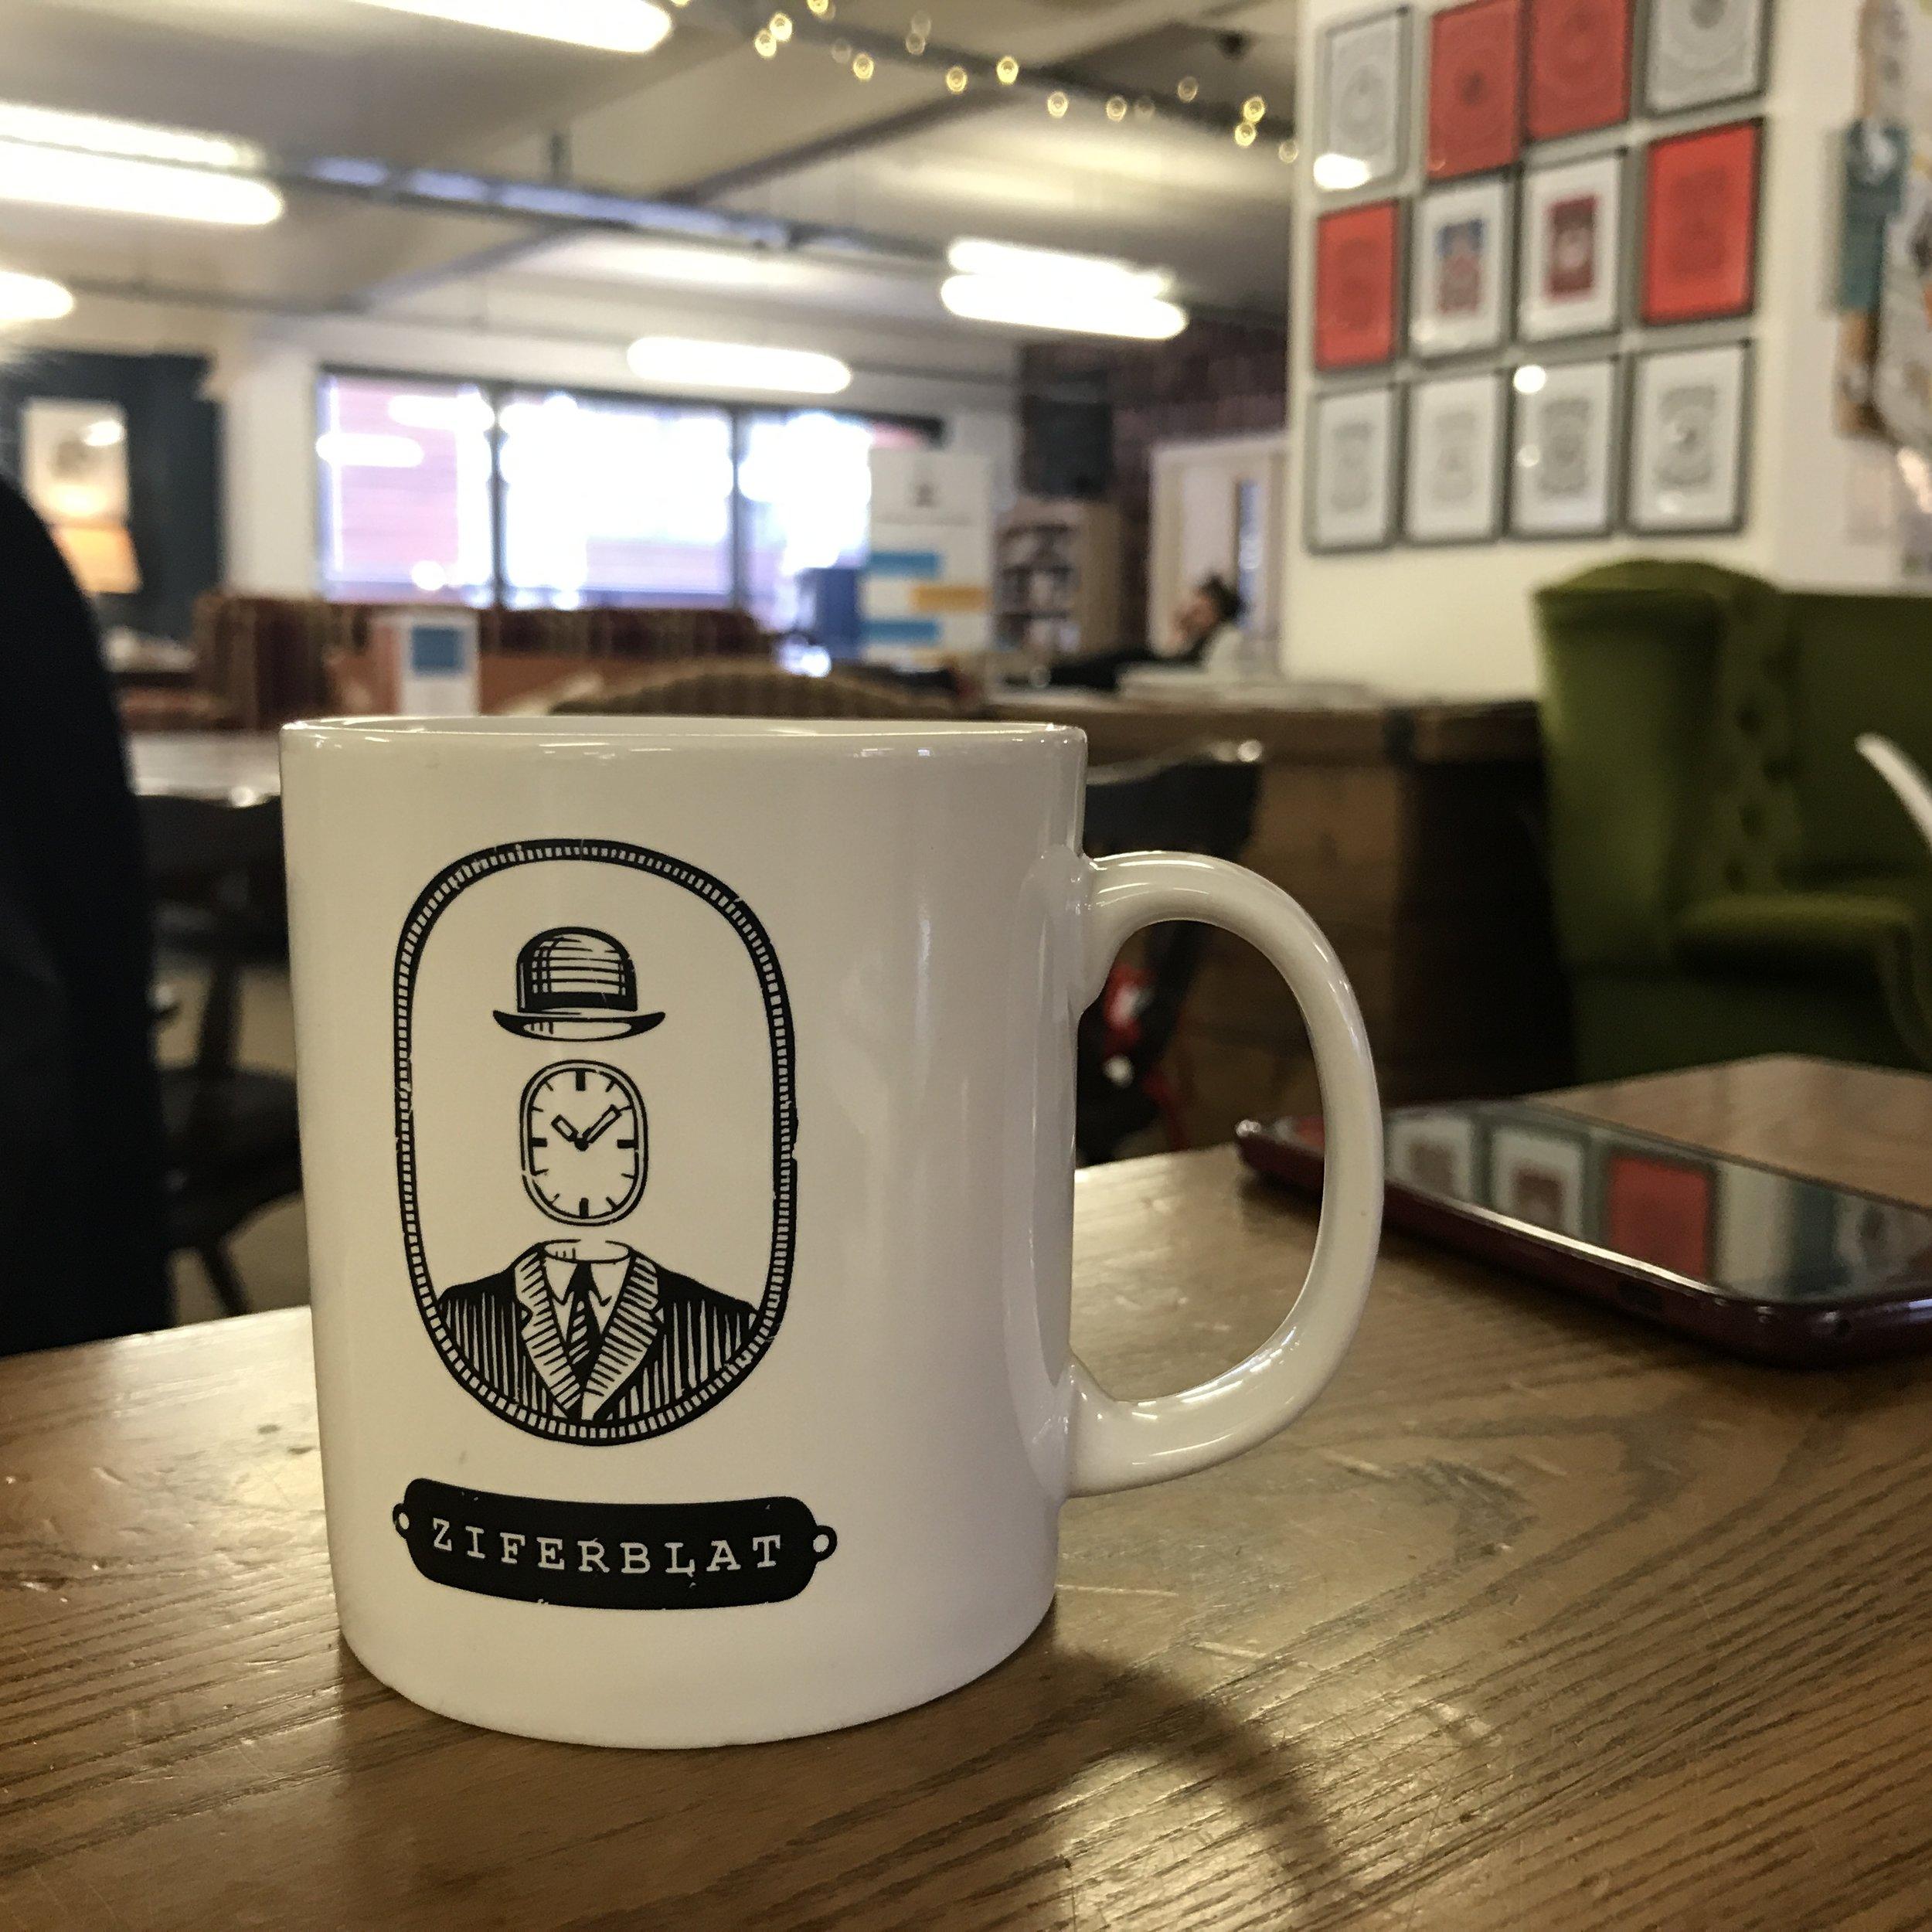 Ziferblat logo on my mug.